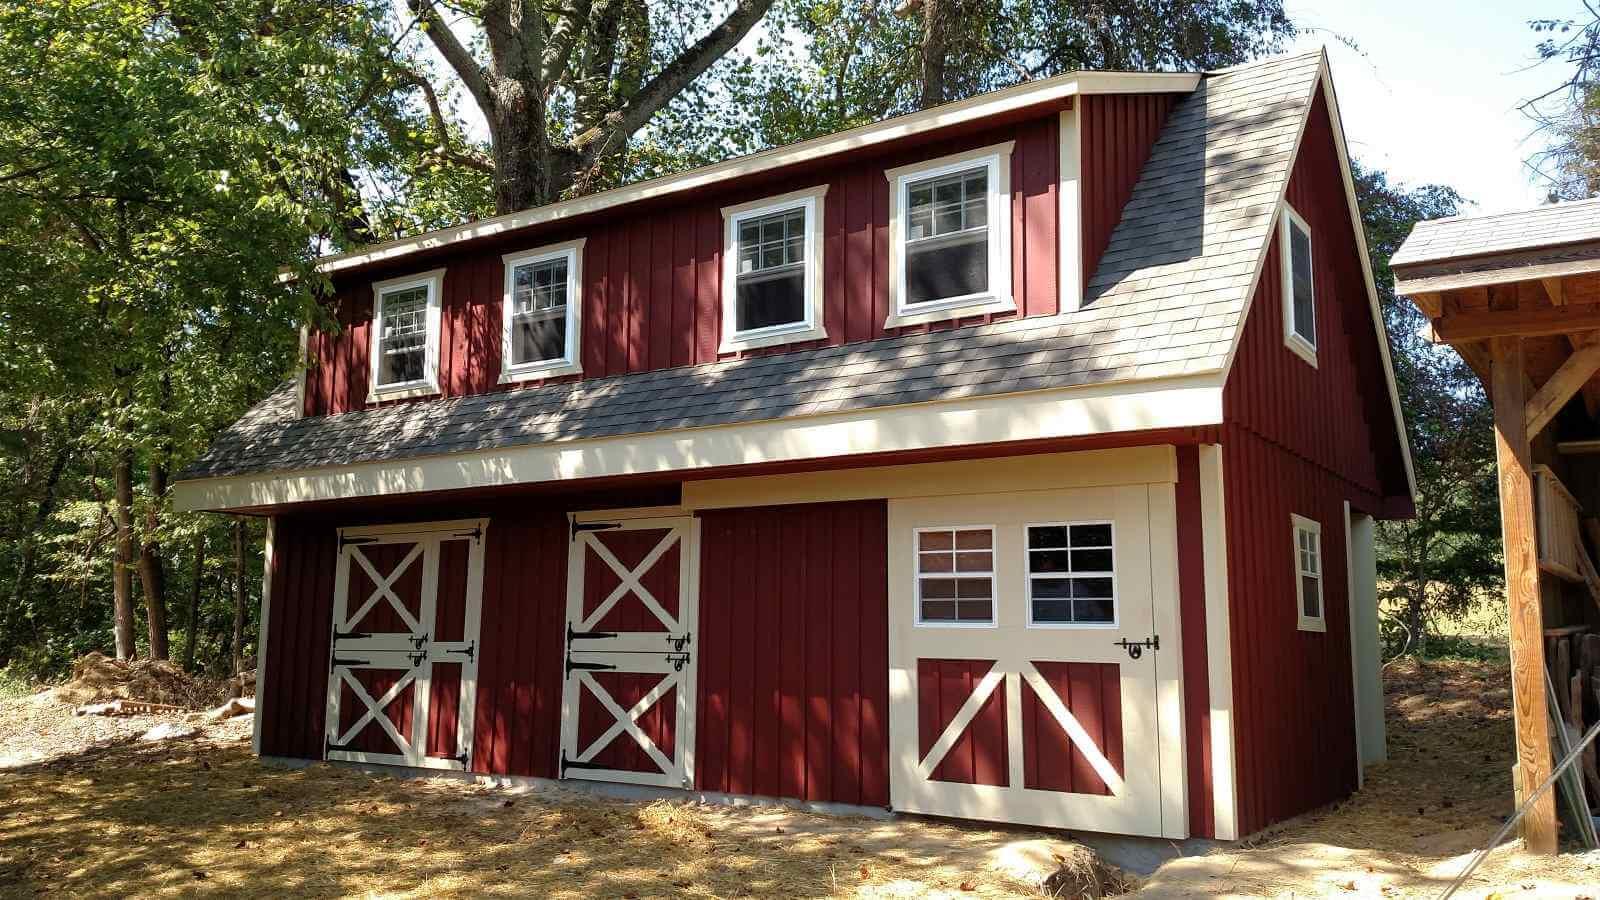 2 story red barn - Horse Barns of Virginia